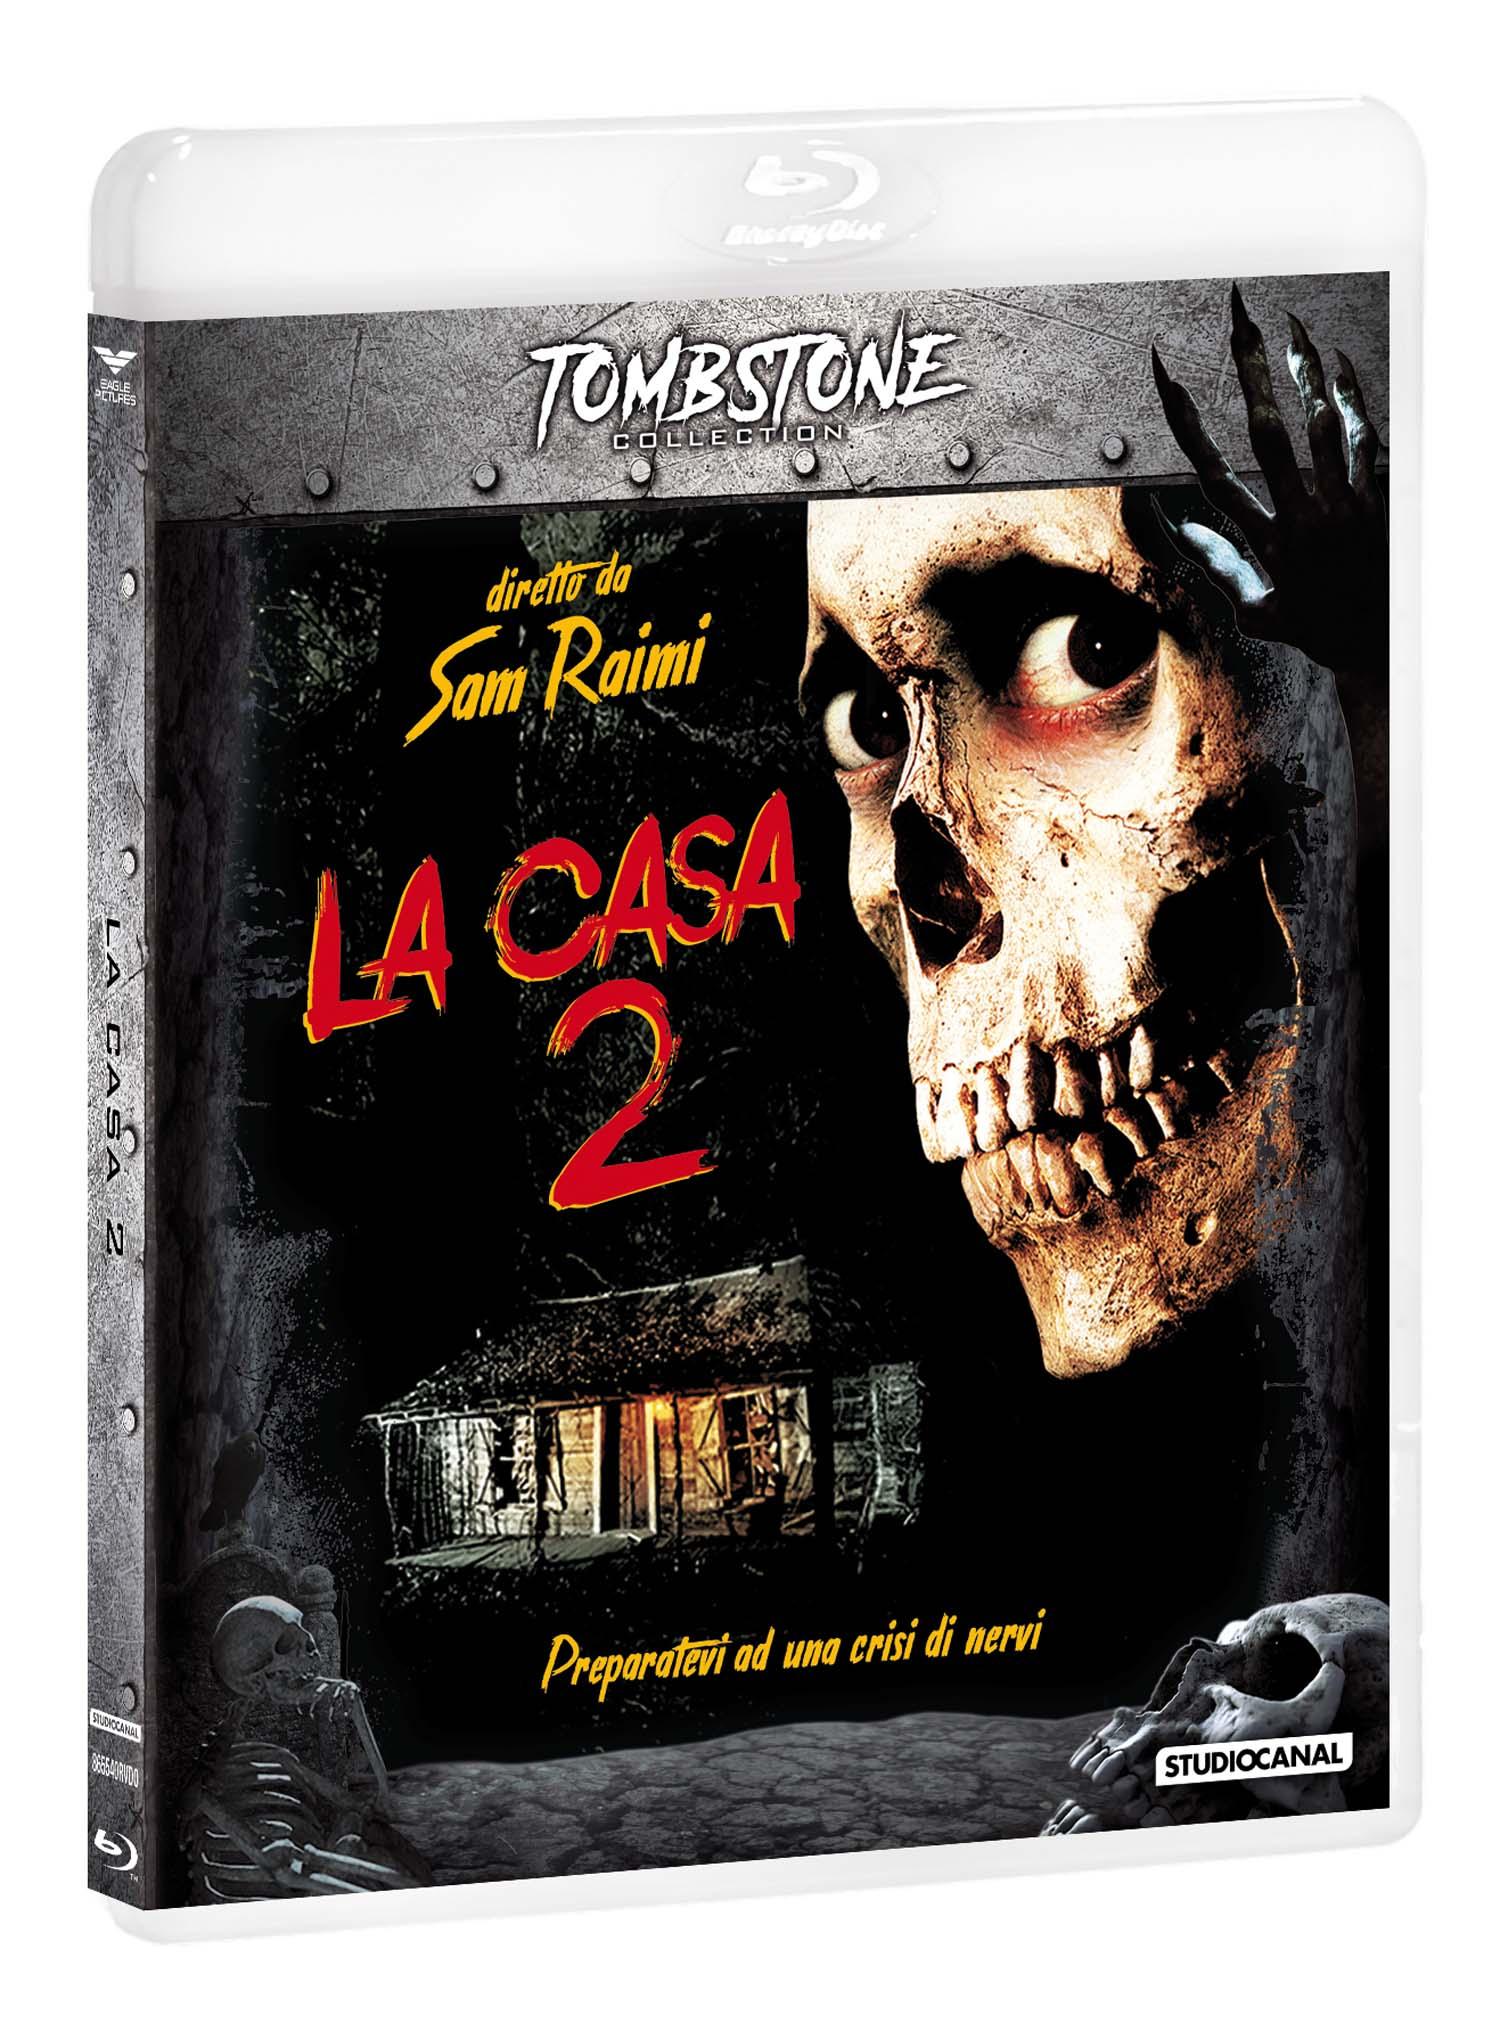 LA CASA 2 (TOMBSTONE) - BLU RAY